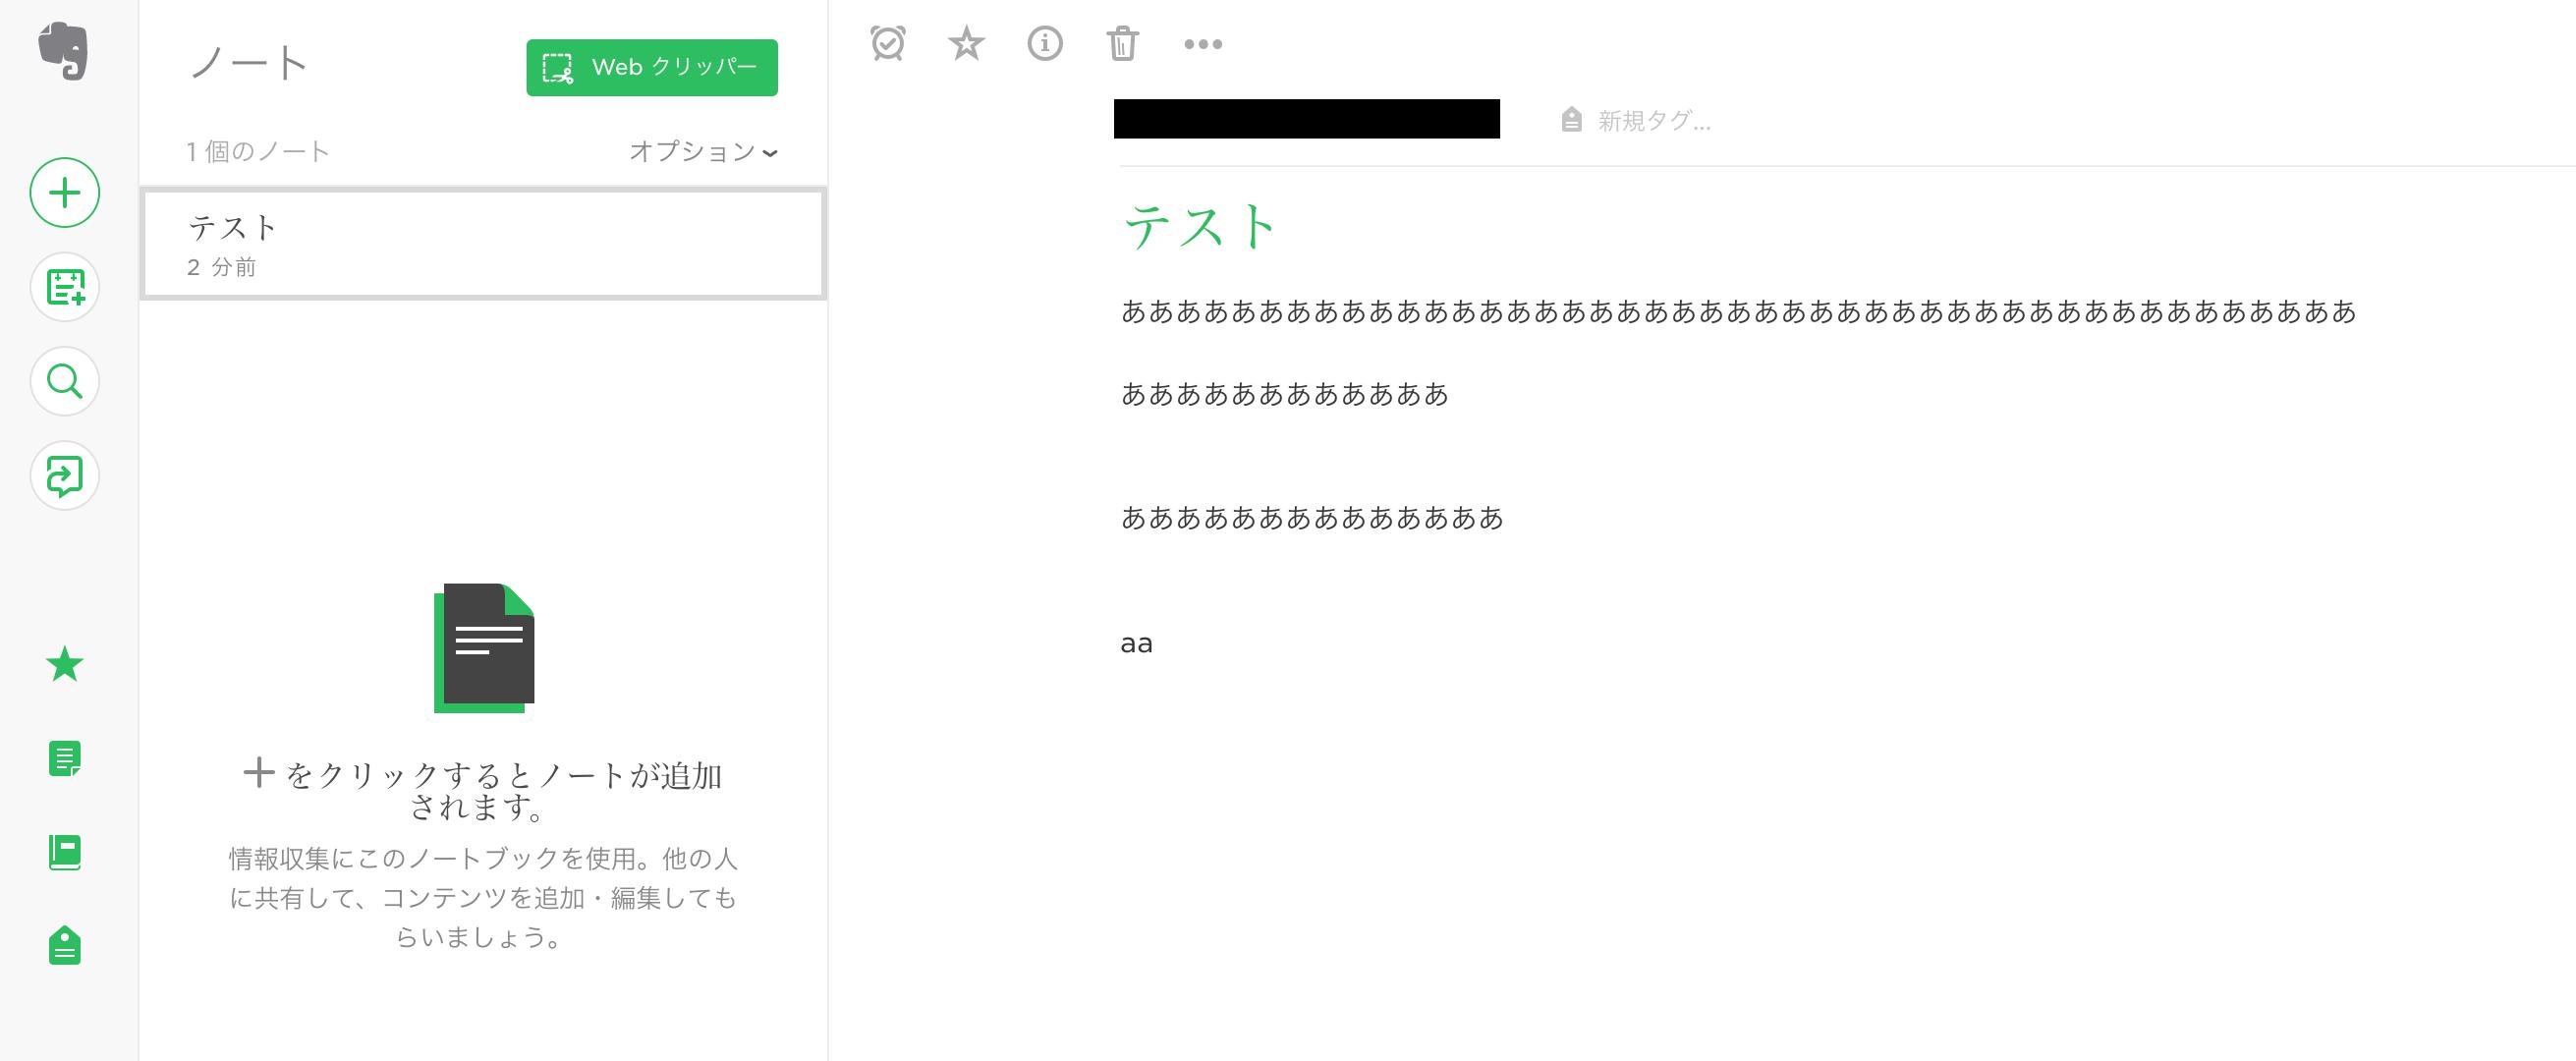 EvernoteのWeb版で文字数を見る